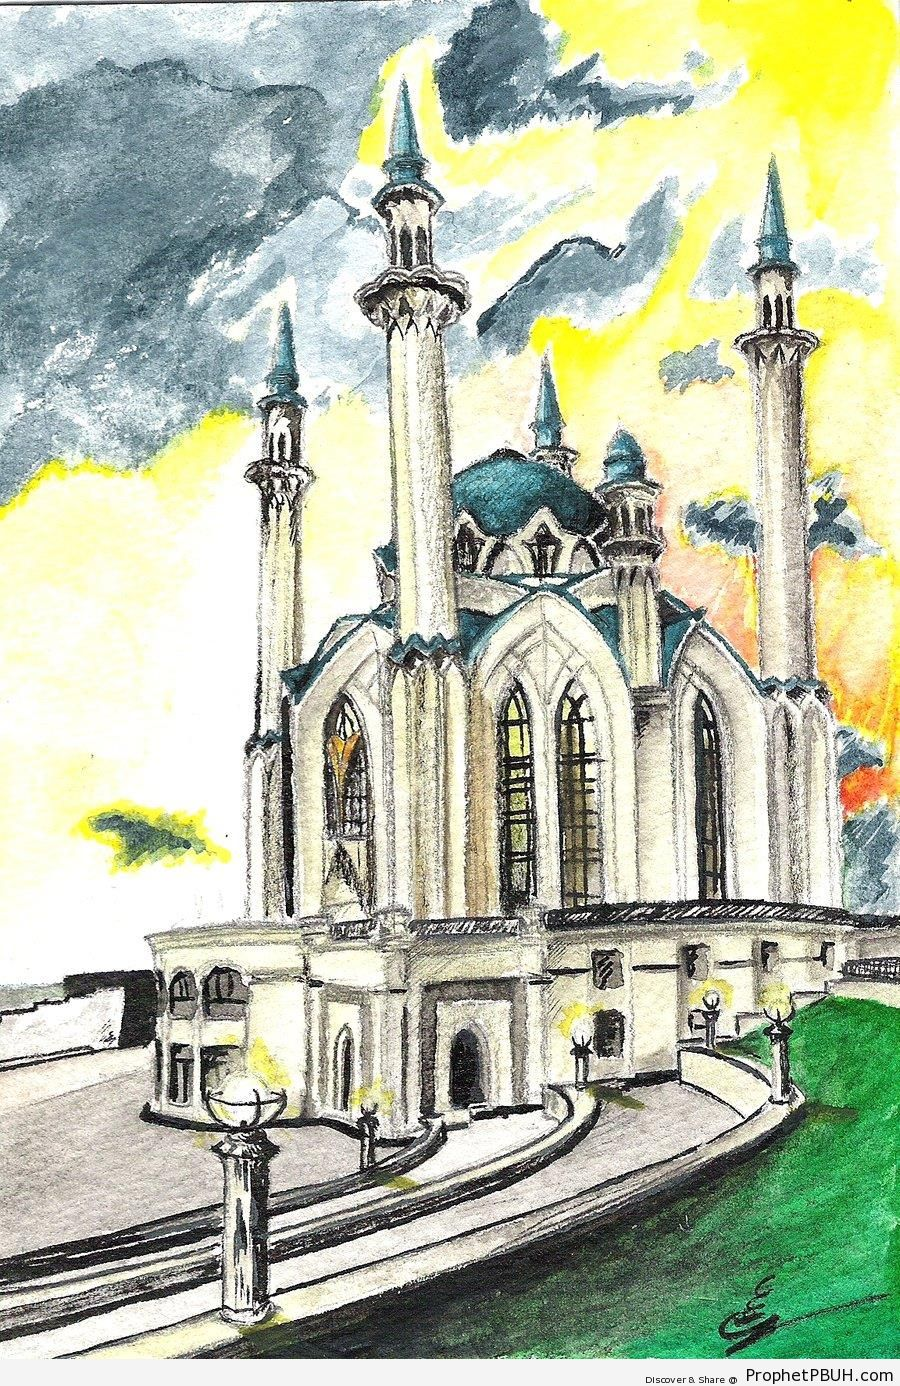 Drawing of the Qolsharif Mosque in Kazan, Tatarstan - Drawings